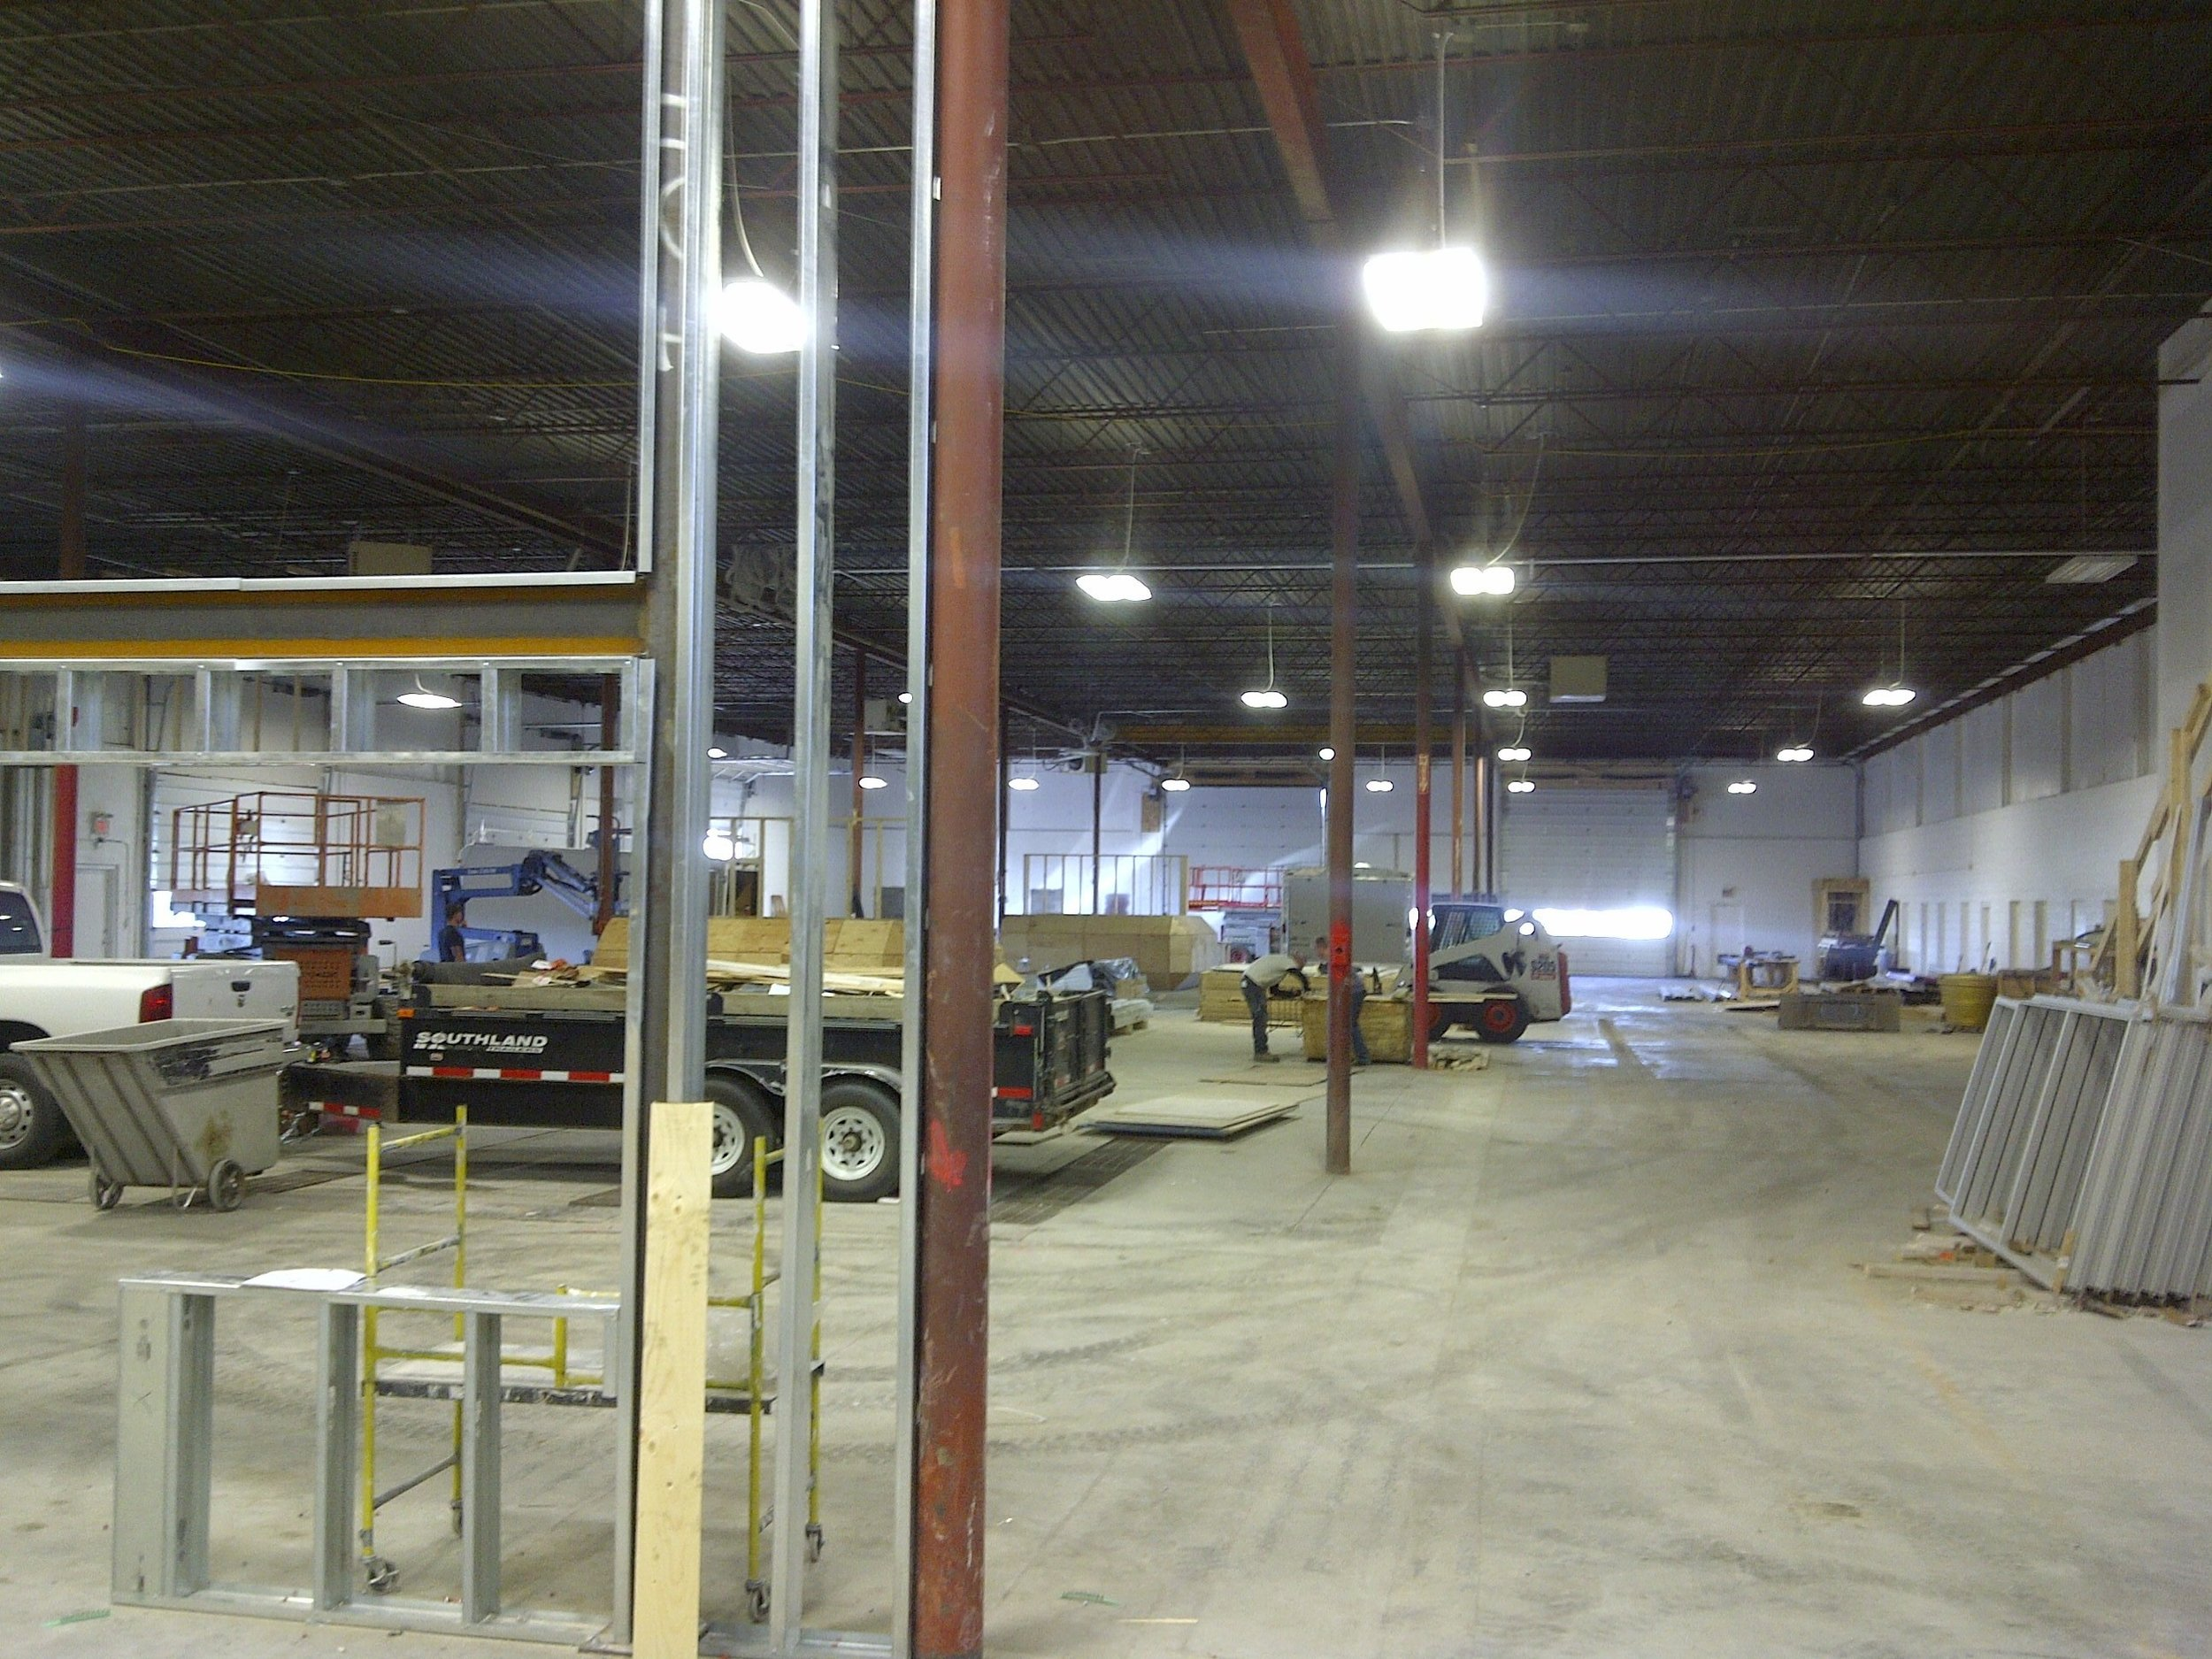 Source Auto  Located at 12866 - 153 St, Edmonton AB.  A car auction facility.